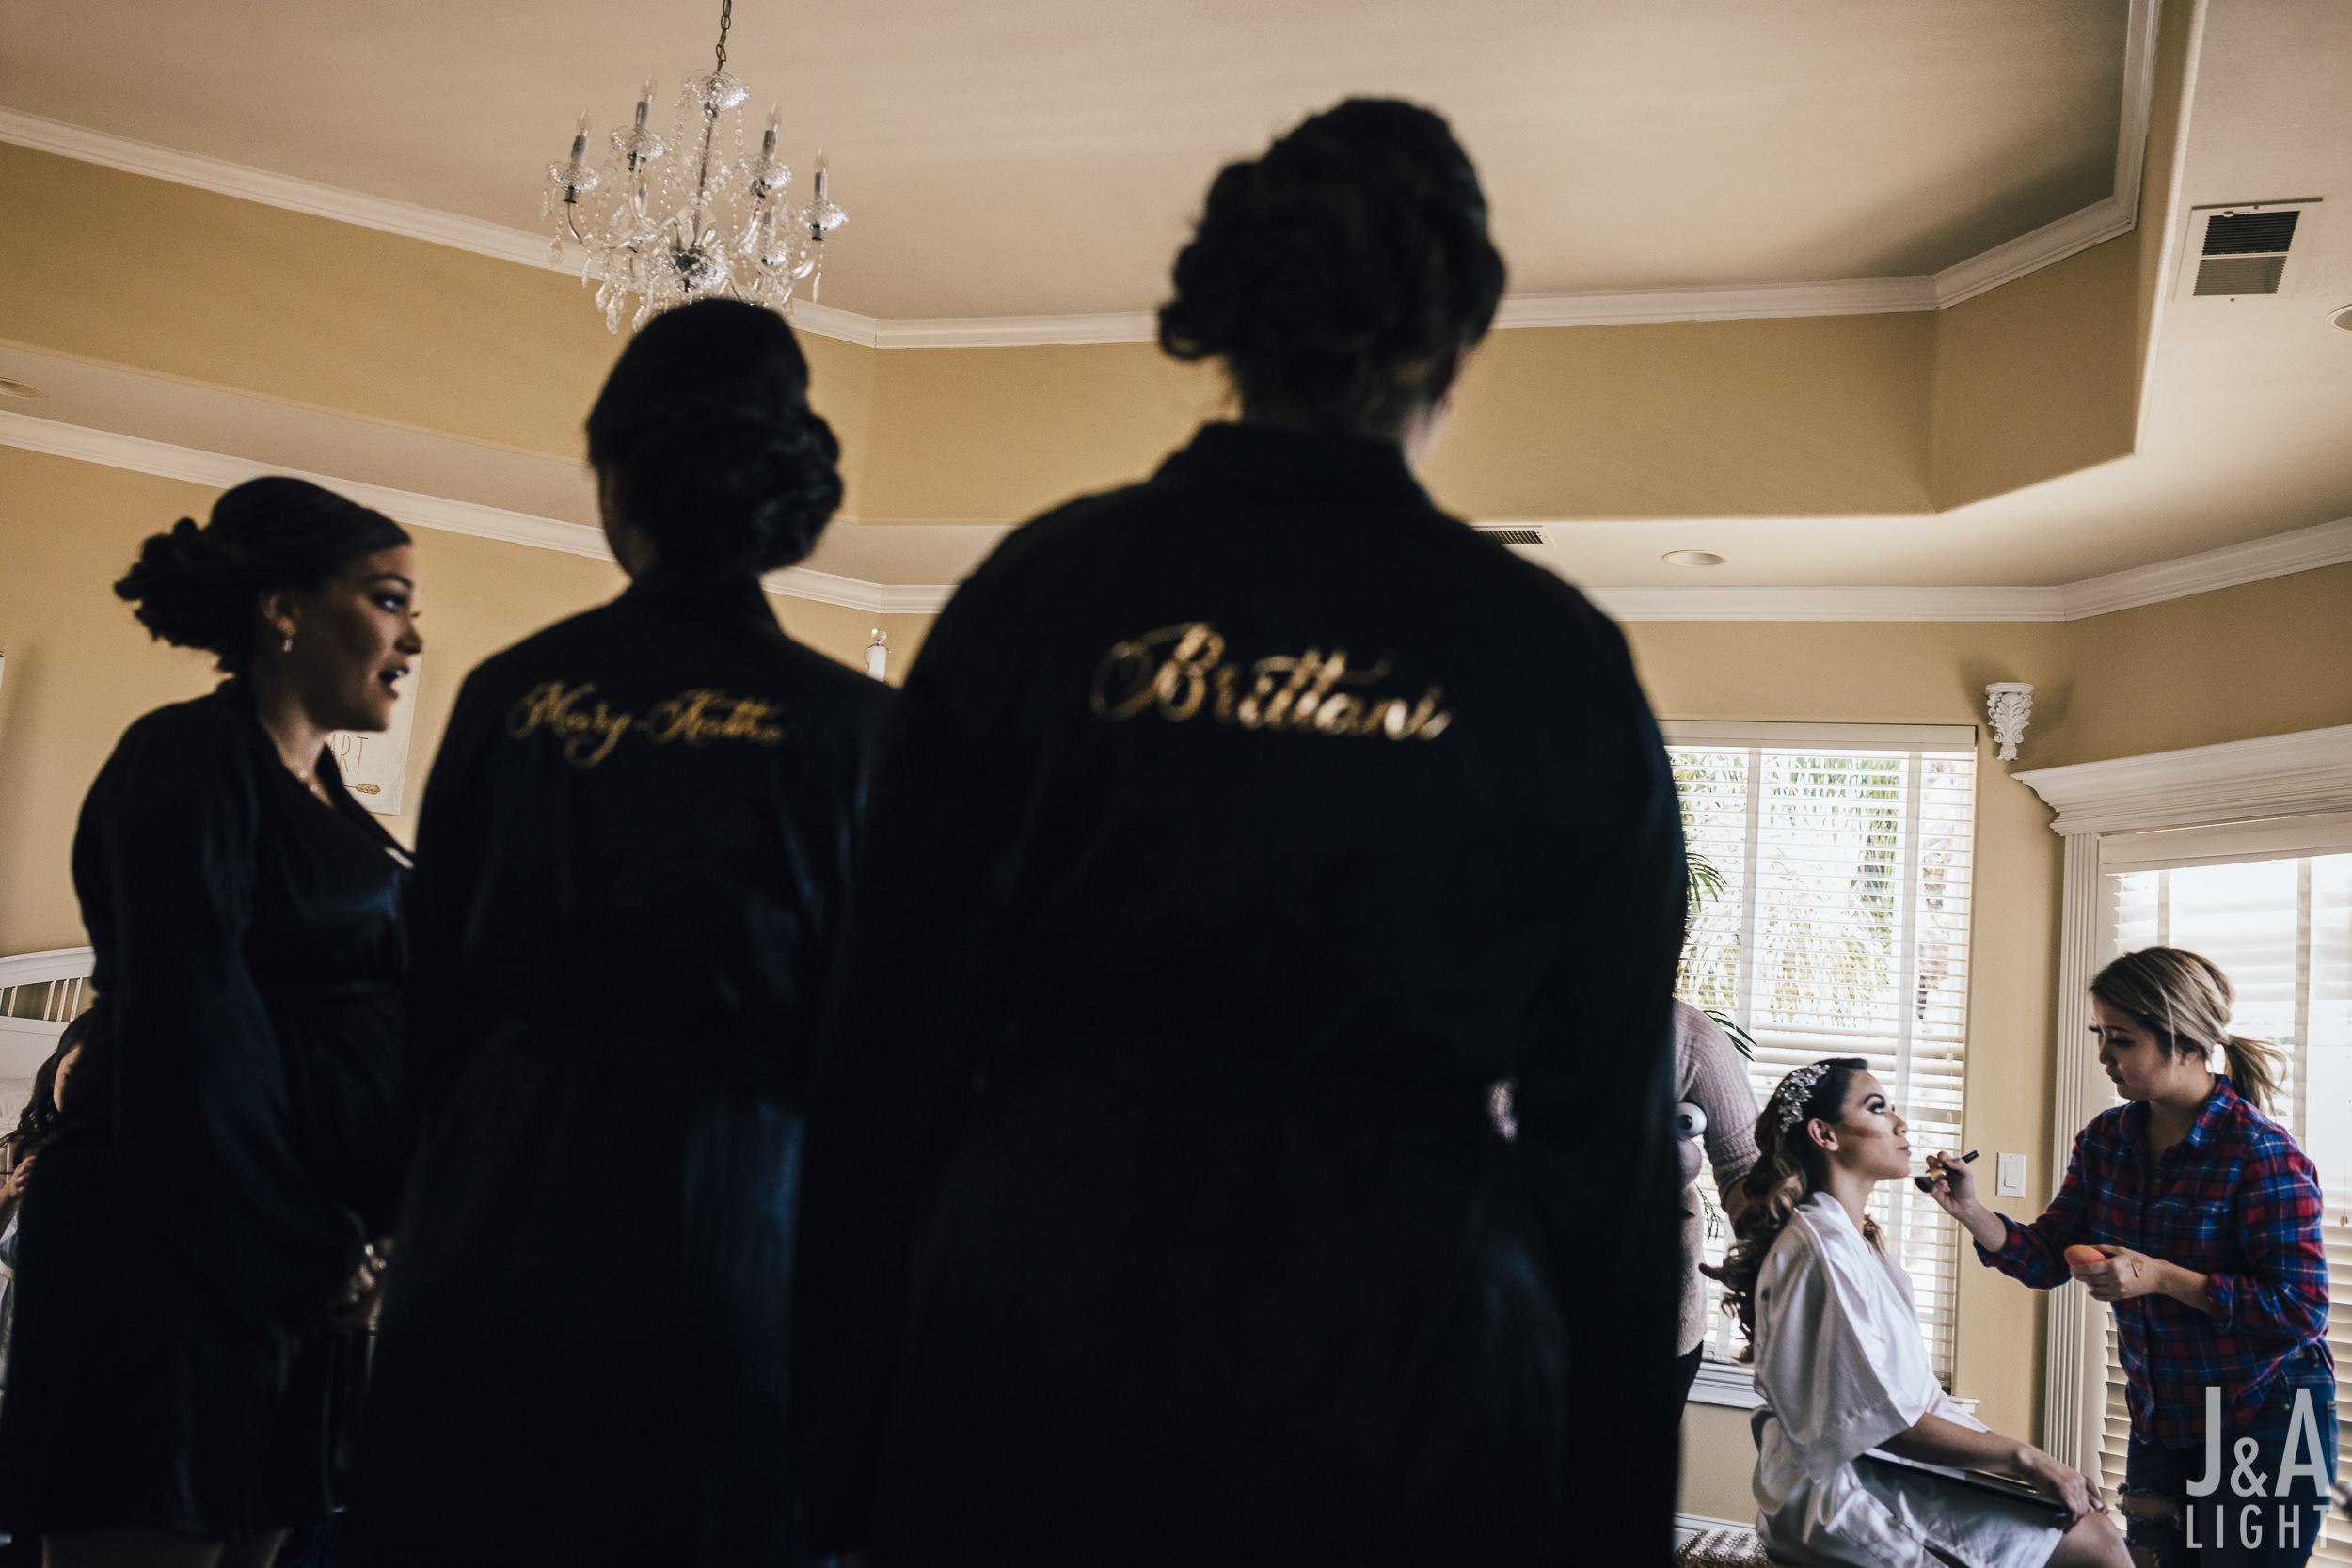 20171014-JanDan-LosBanos-GlassMansion-Wedding-Blog-003.jpg